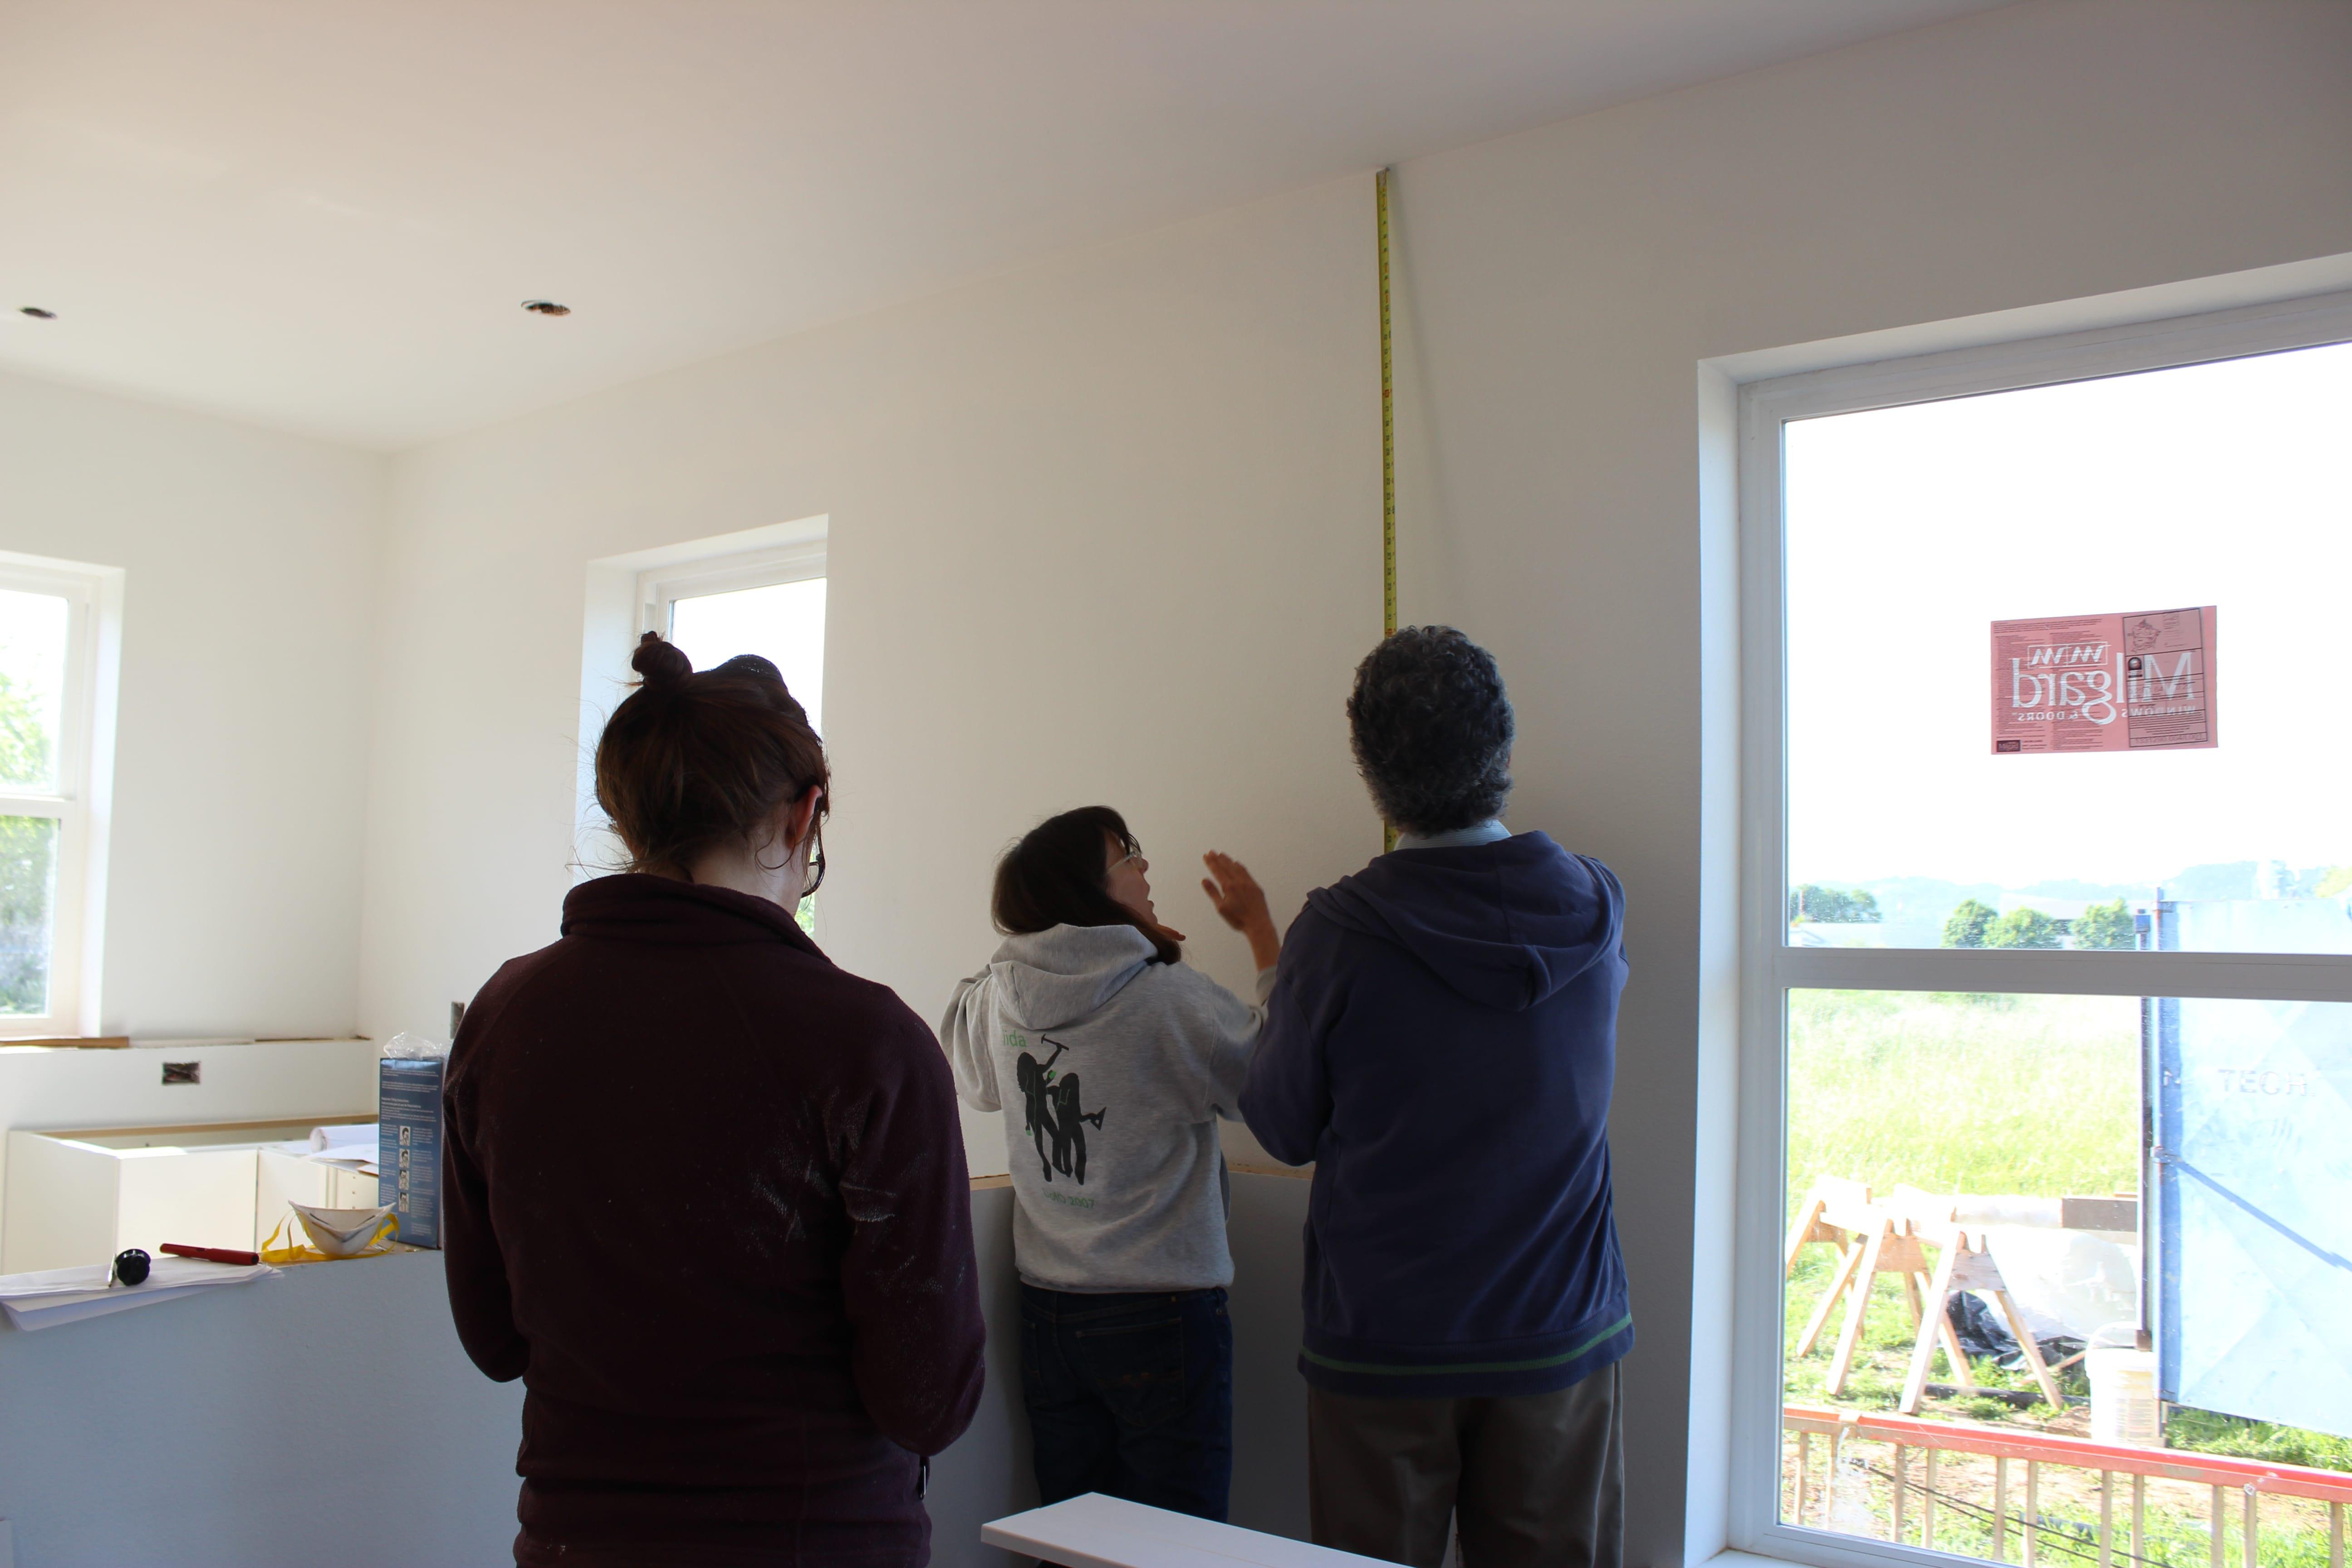 Interior measurements